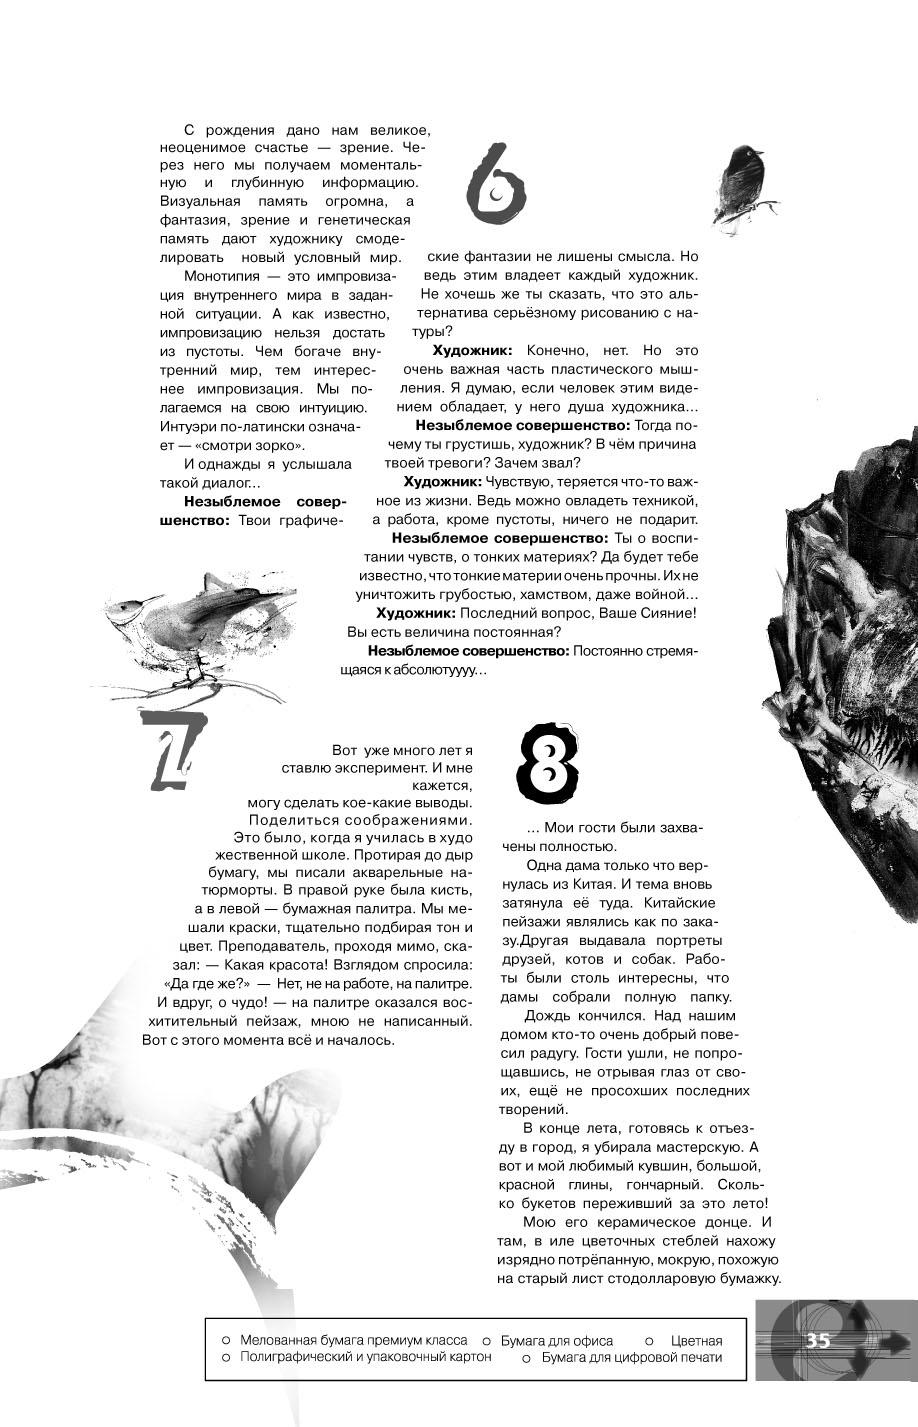 Sborka1.indd